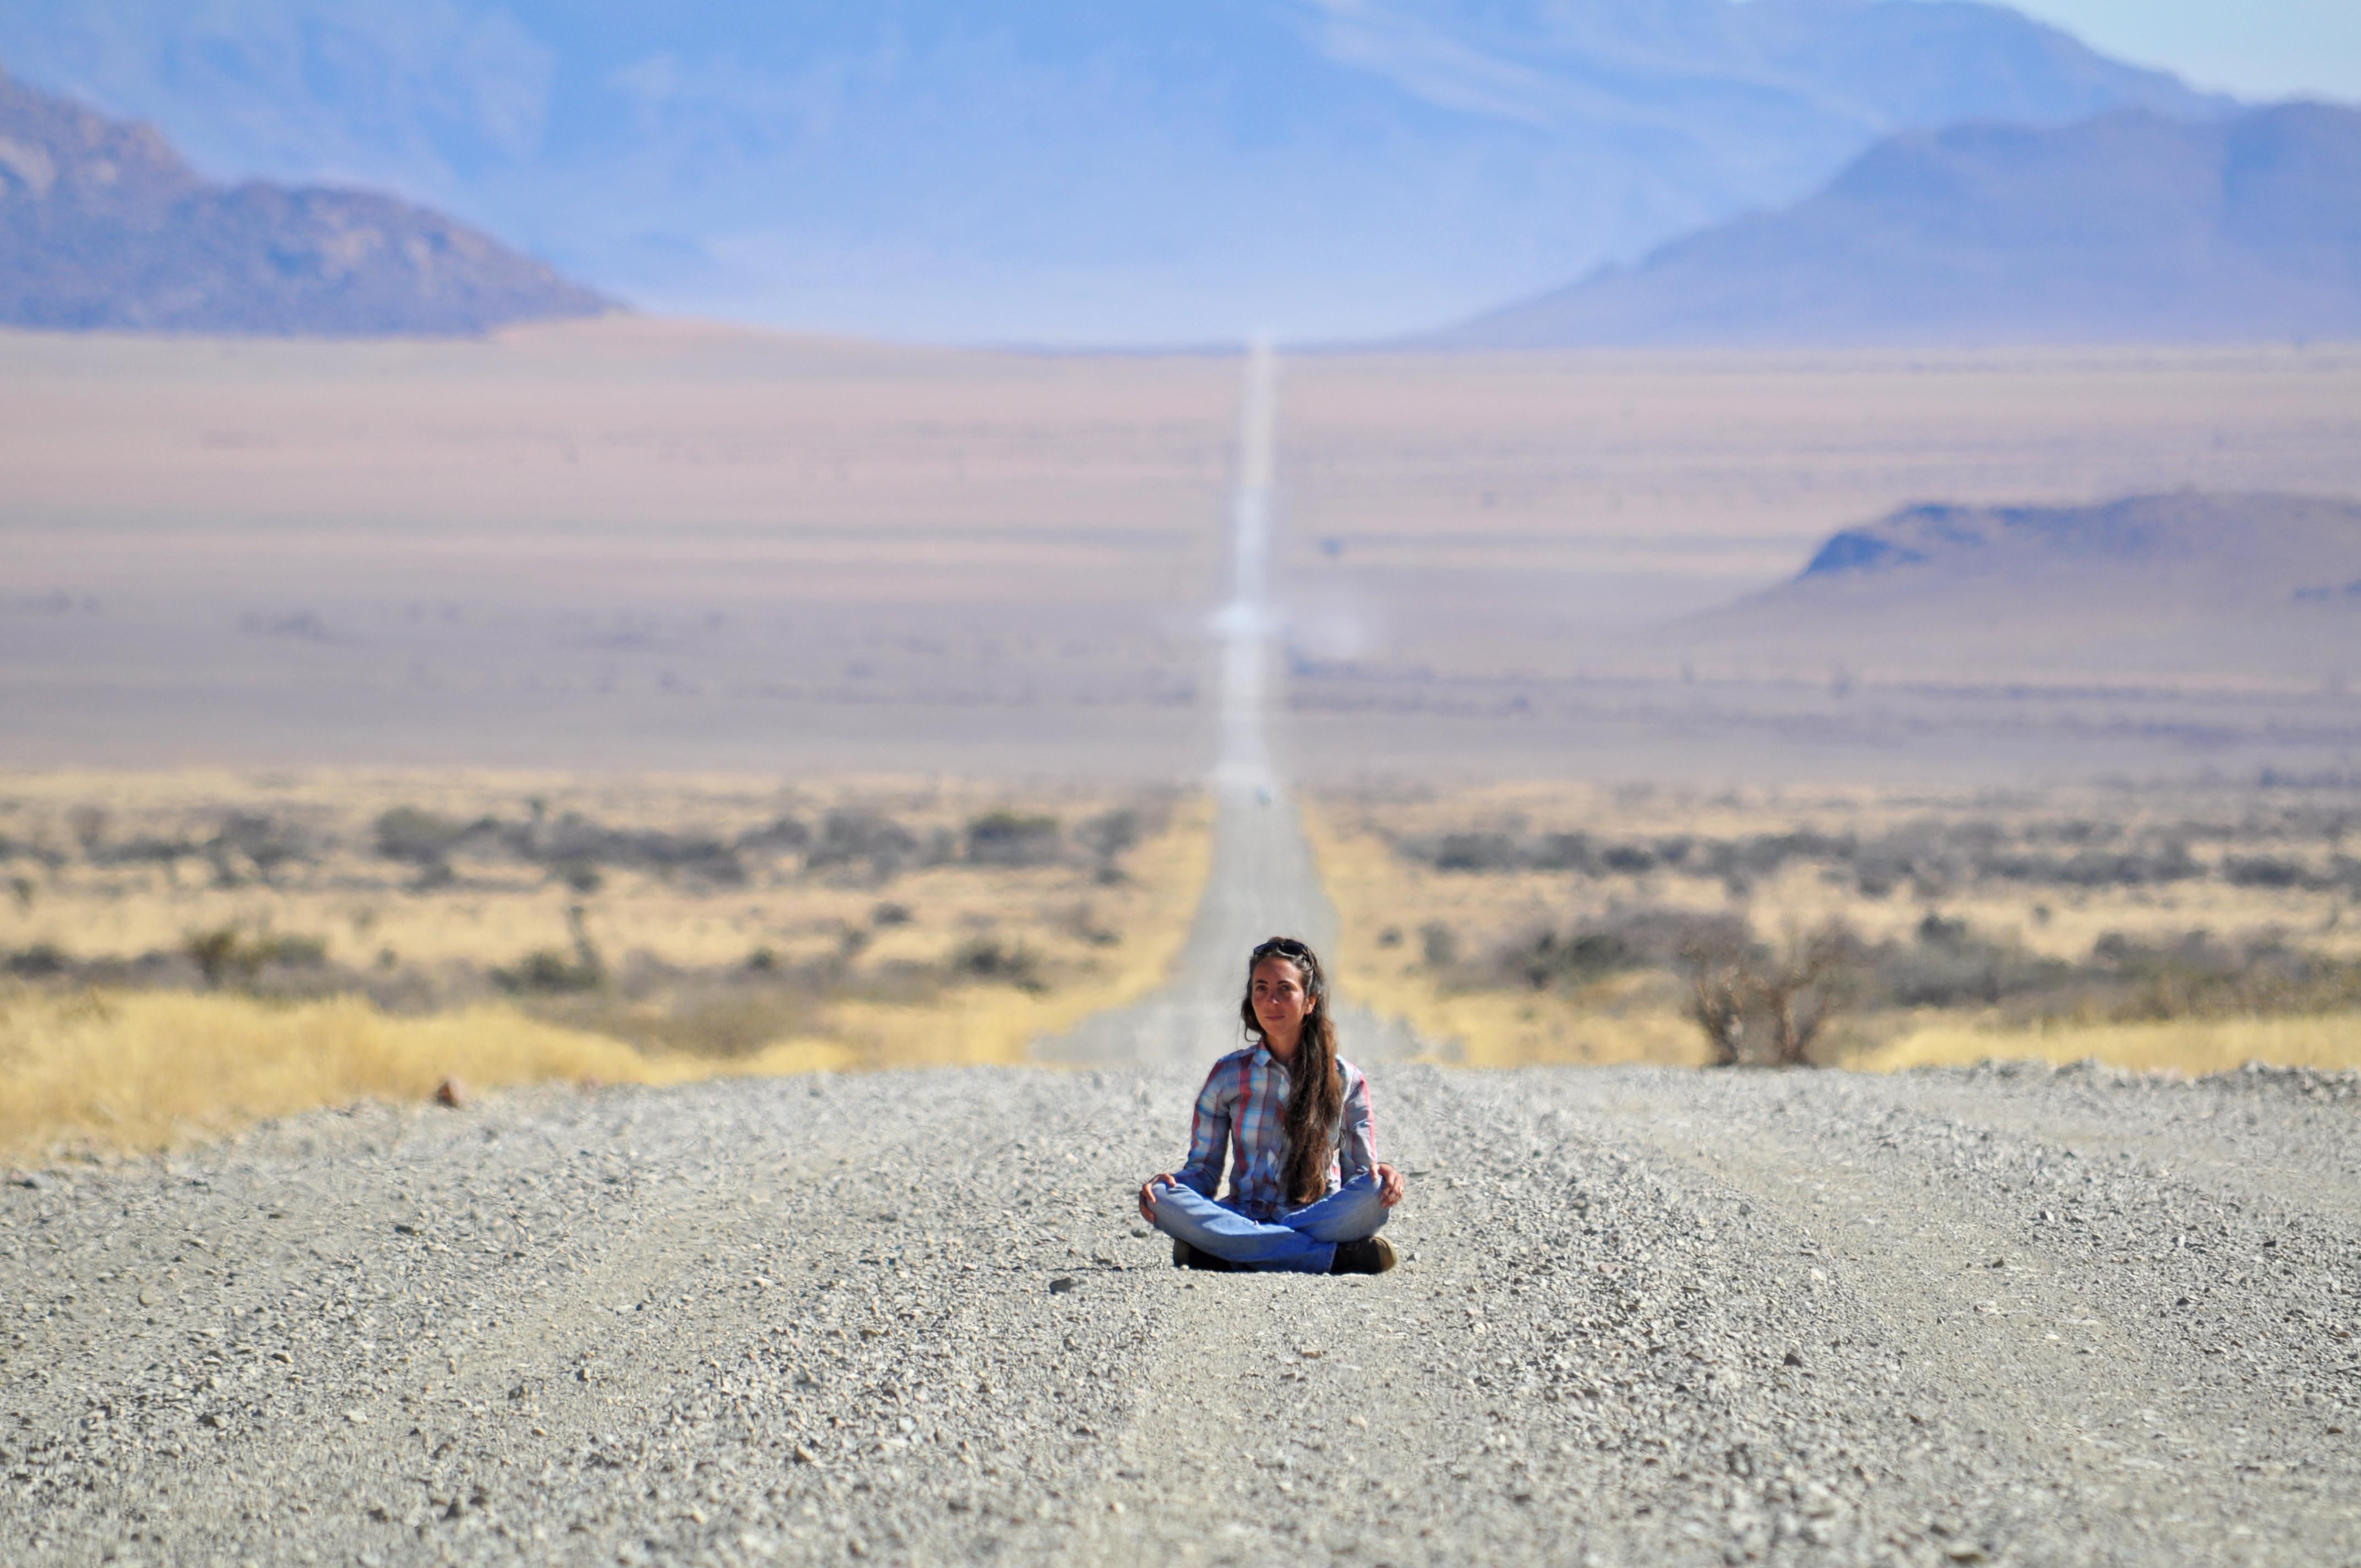 Lara-Scarlett Gervais, quand voyager est un besoin